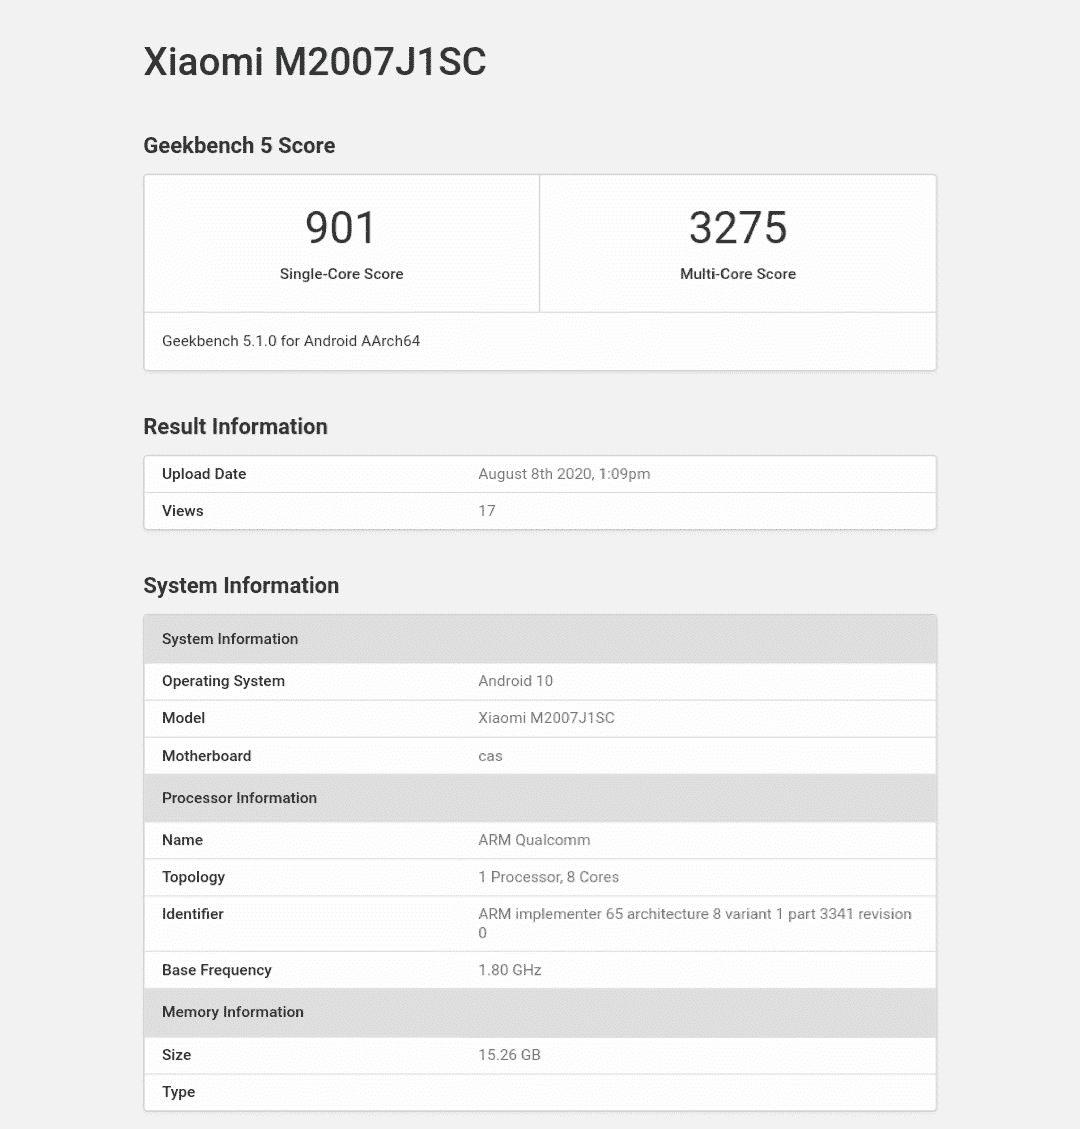 Xiaomi Mi 10 Ultra (M2007J1SC) with 16GB RAM spotted on Geekbench